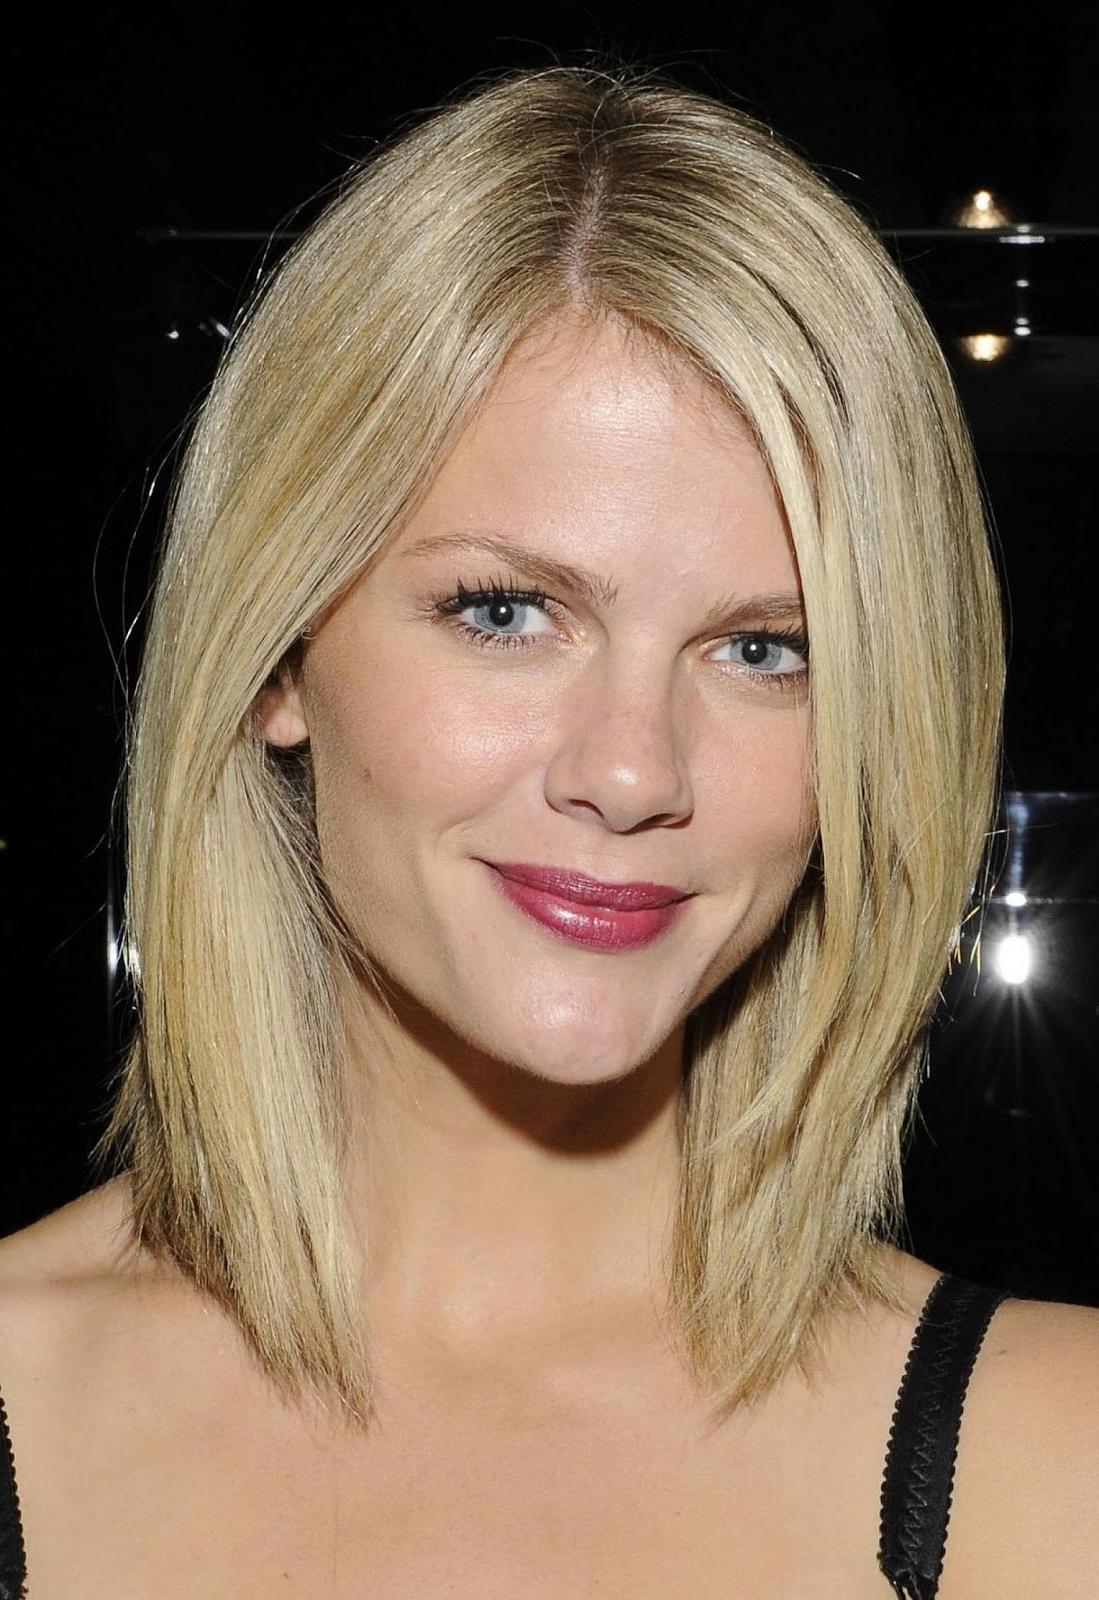 Medium Razor Cut Hairstyles – Hairstyle For Women & Man Regarding Well Known Razor Cut Medium Hairstyles (View 10 of 20)